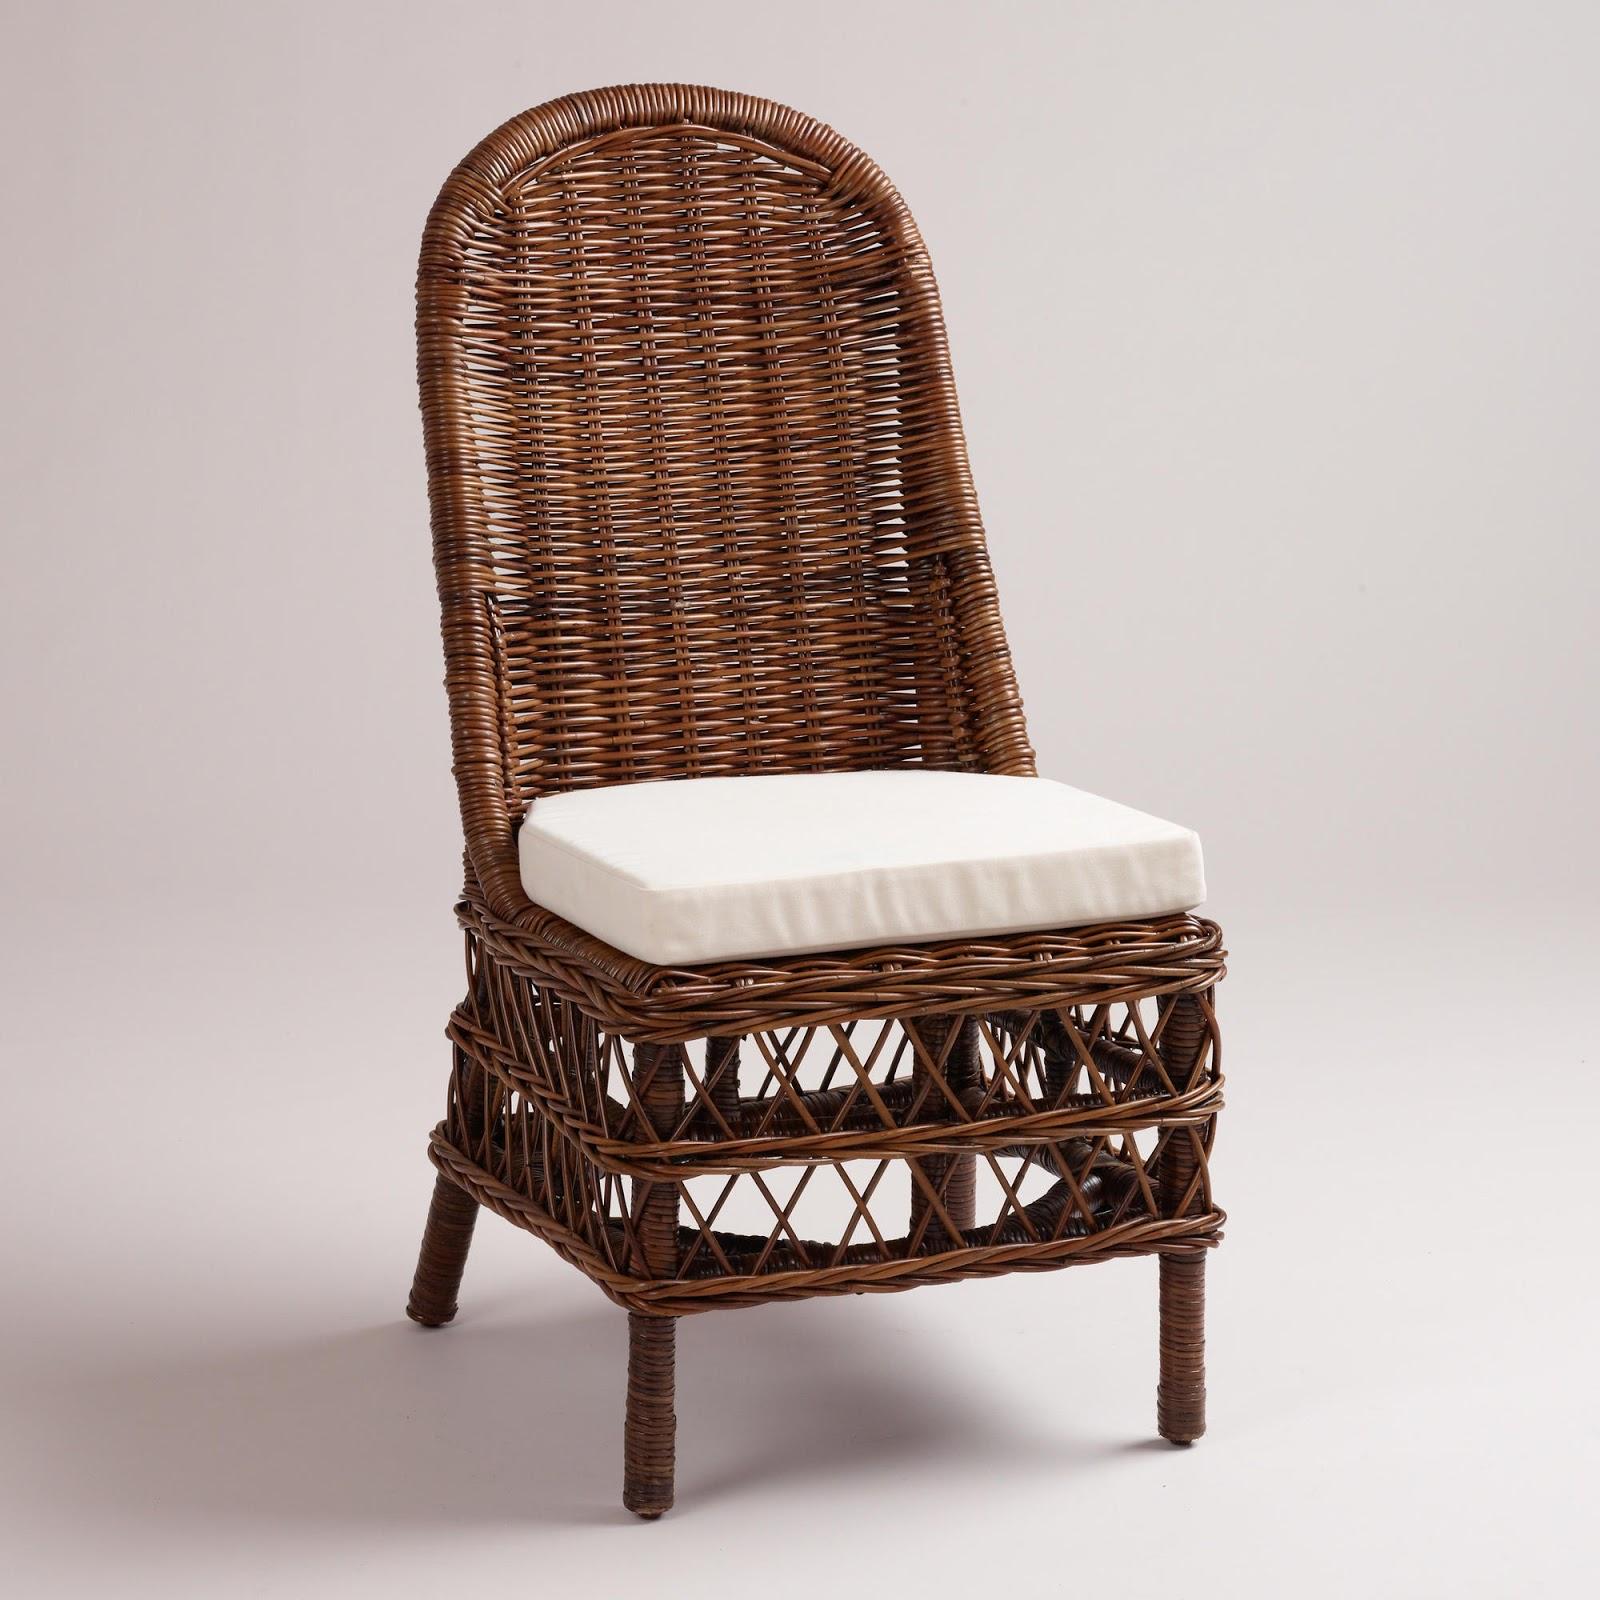 vignette design Musical Rattan Chairs